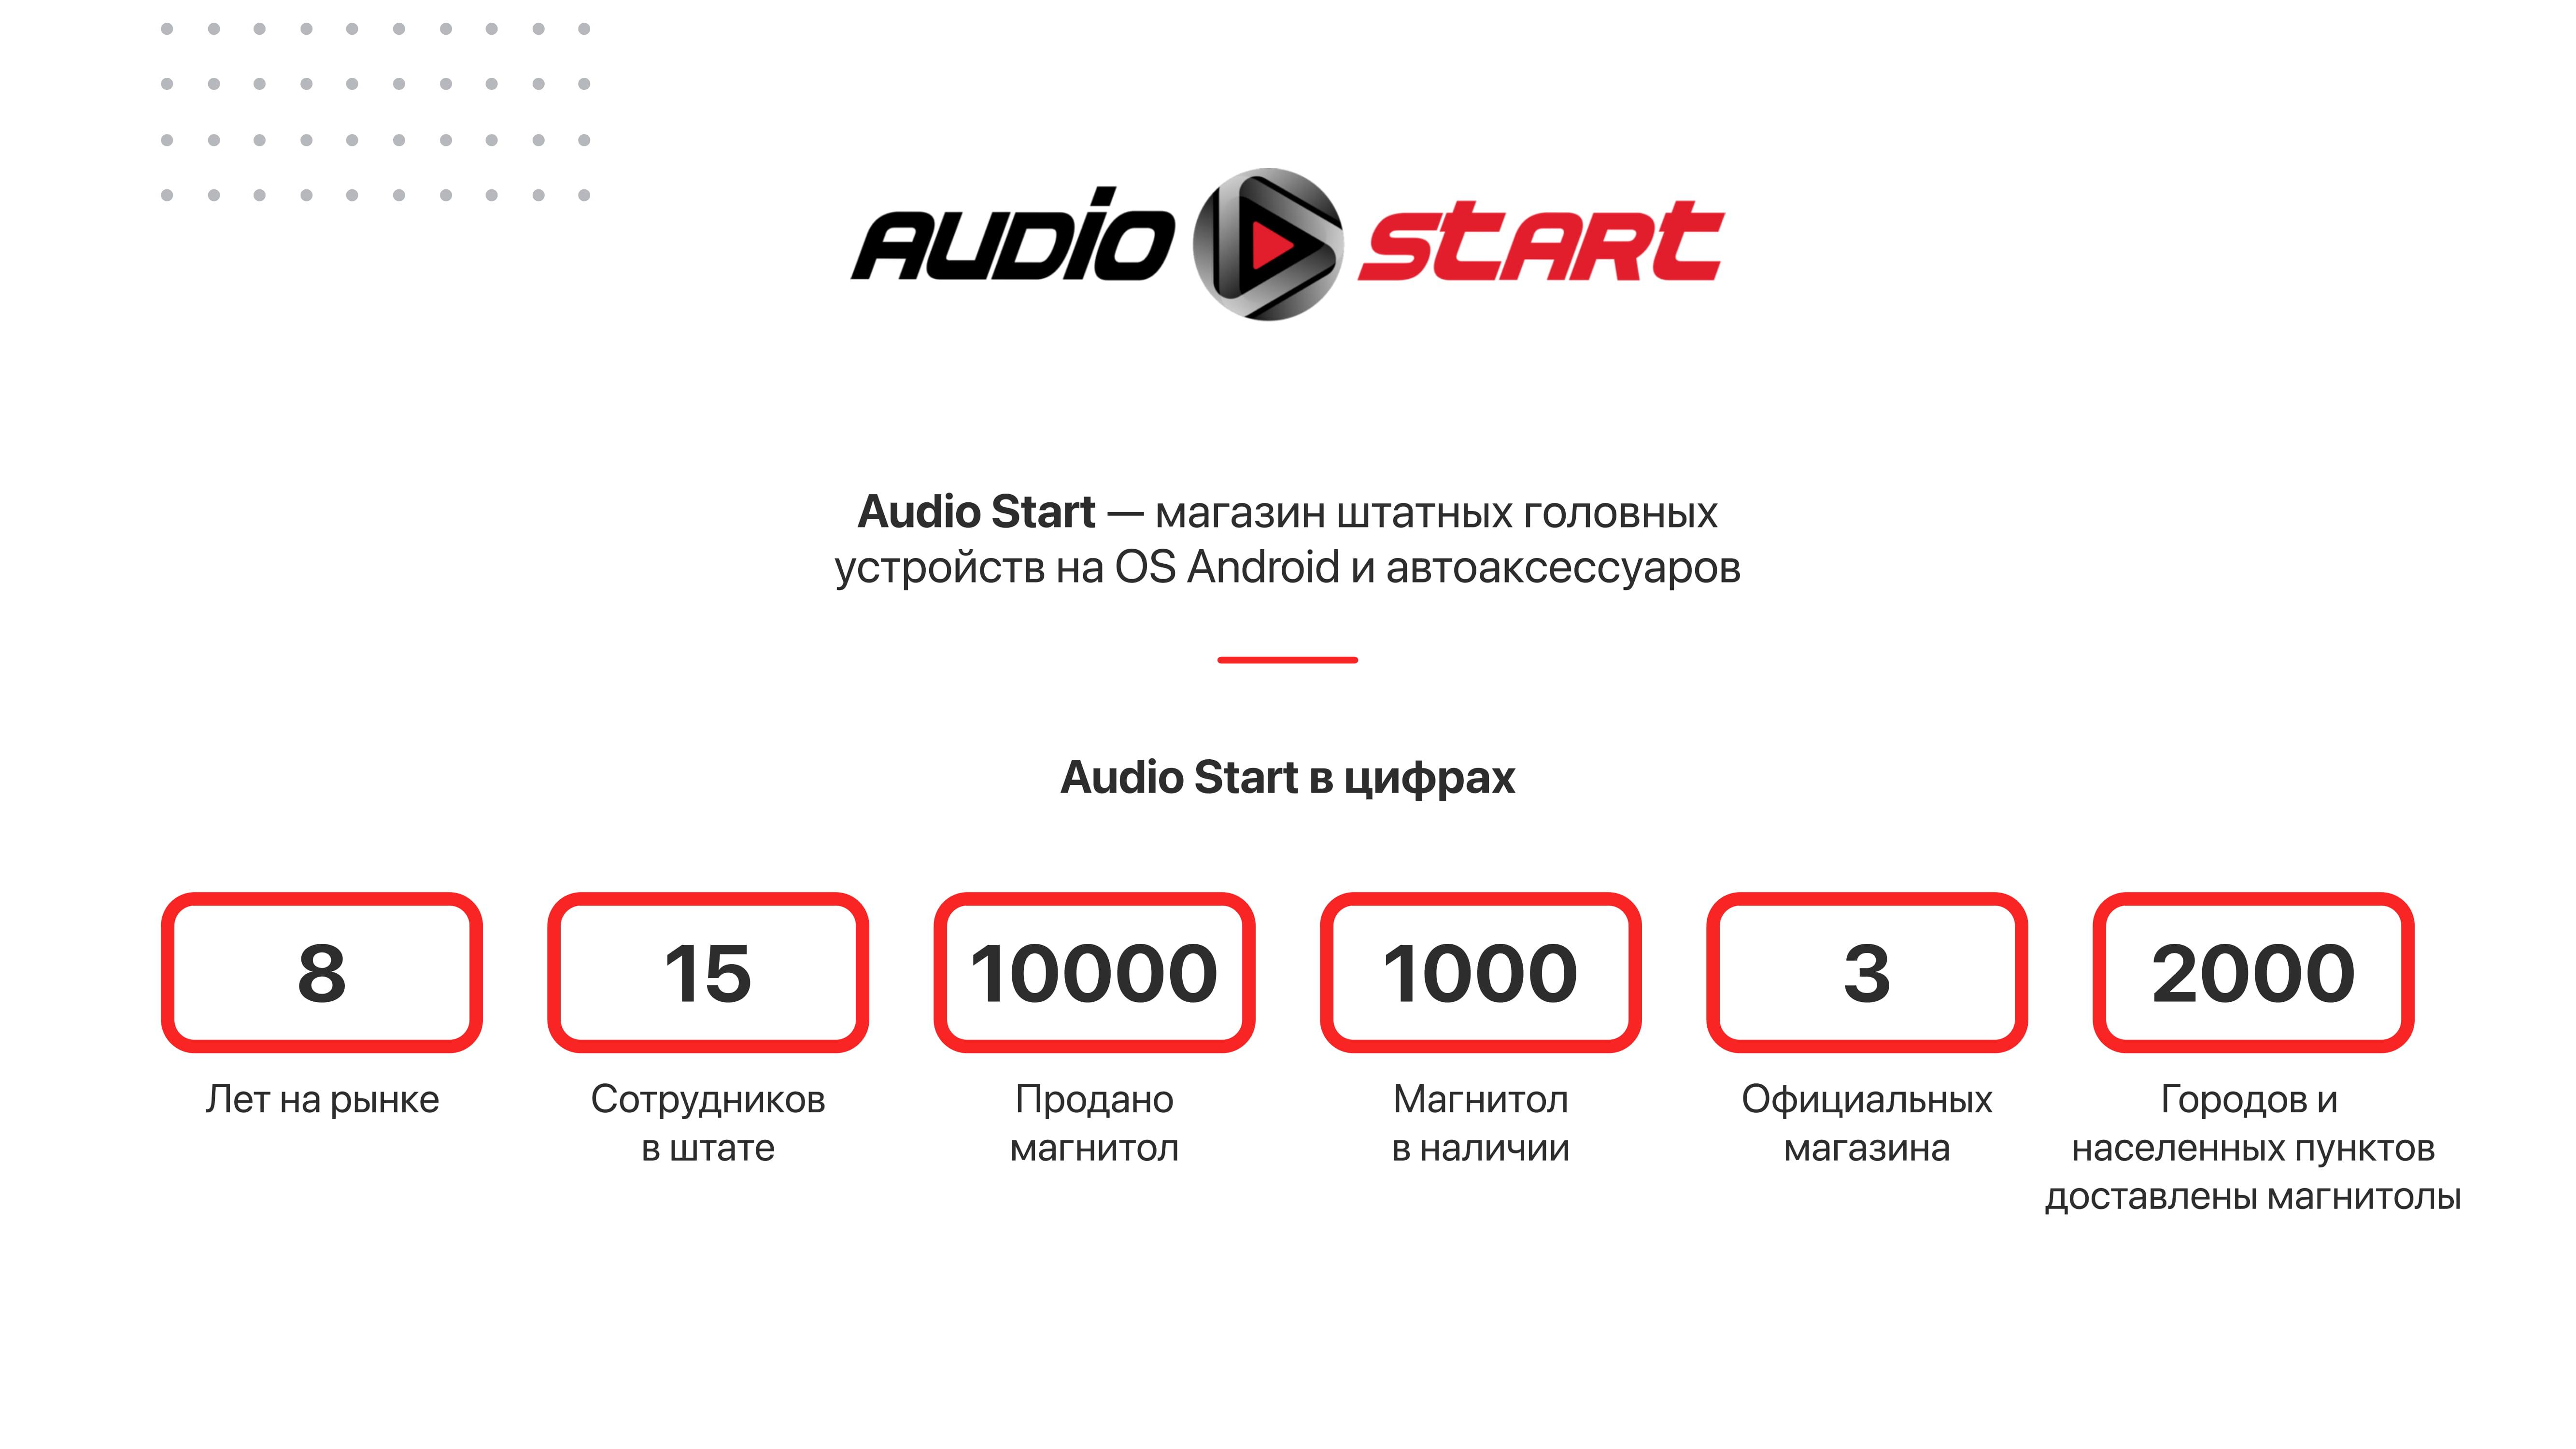 https://audiostart.ru/images/upload/Audio%20Start%20Presentation%20Print-02.jpg